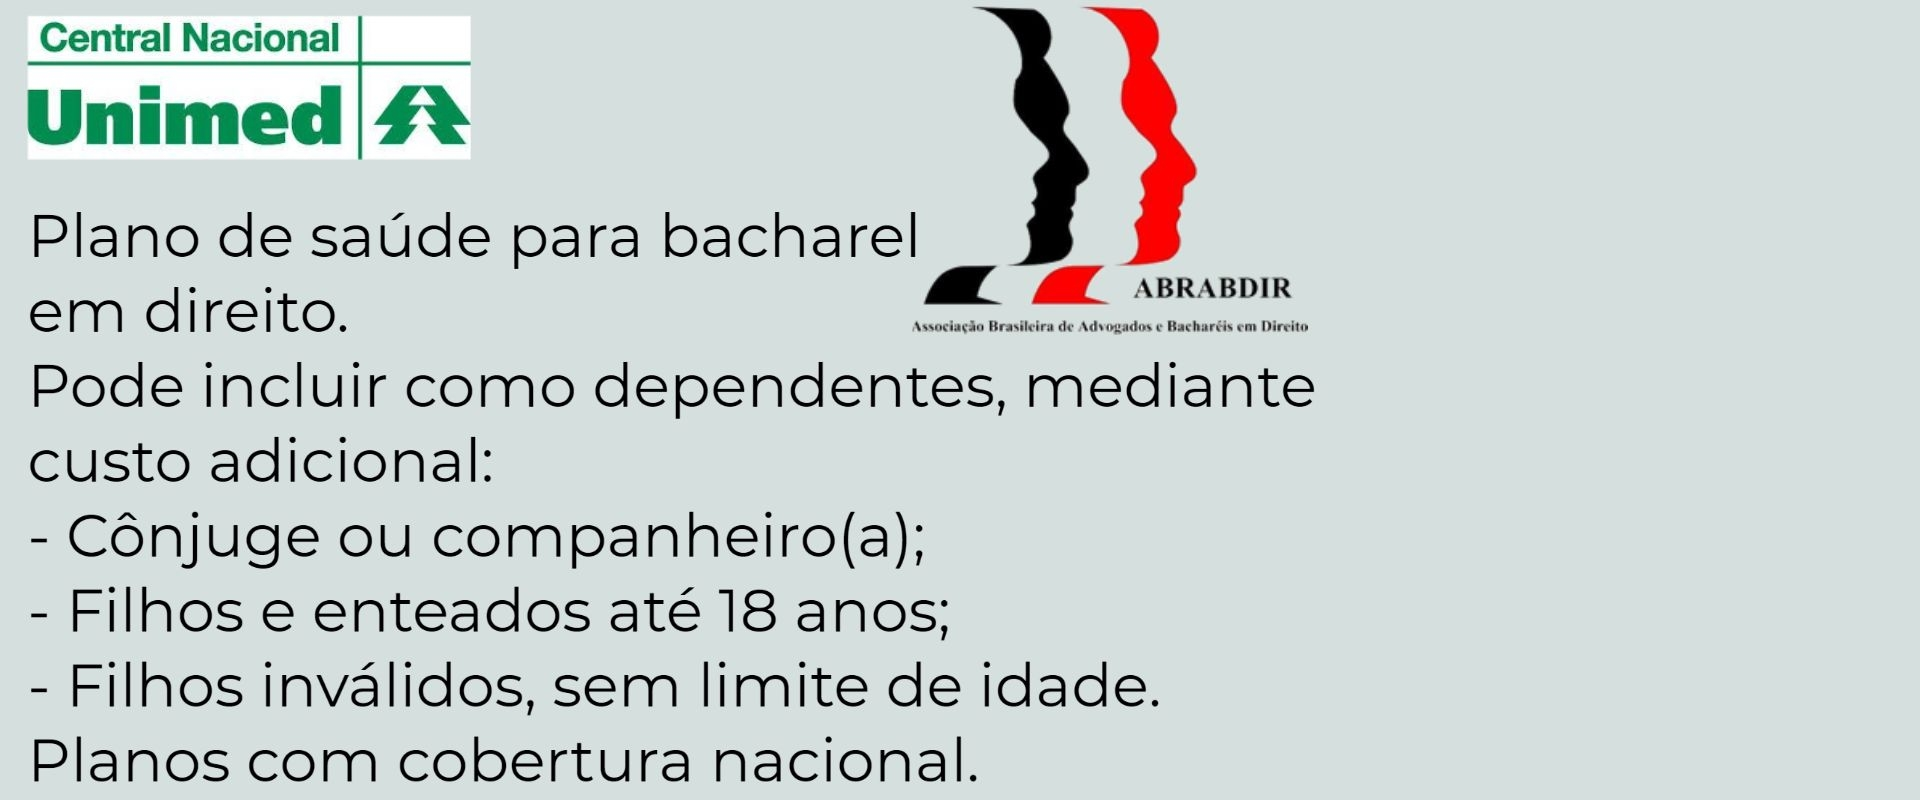 Unimed ABRABDIR Cosmópolis